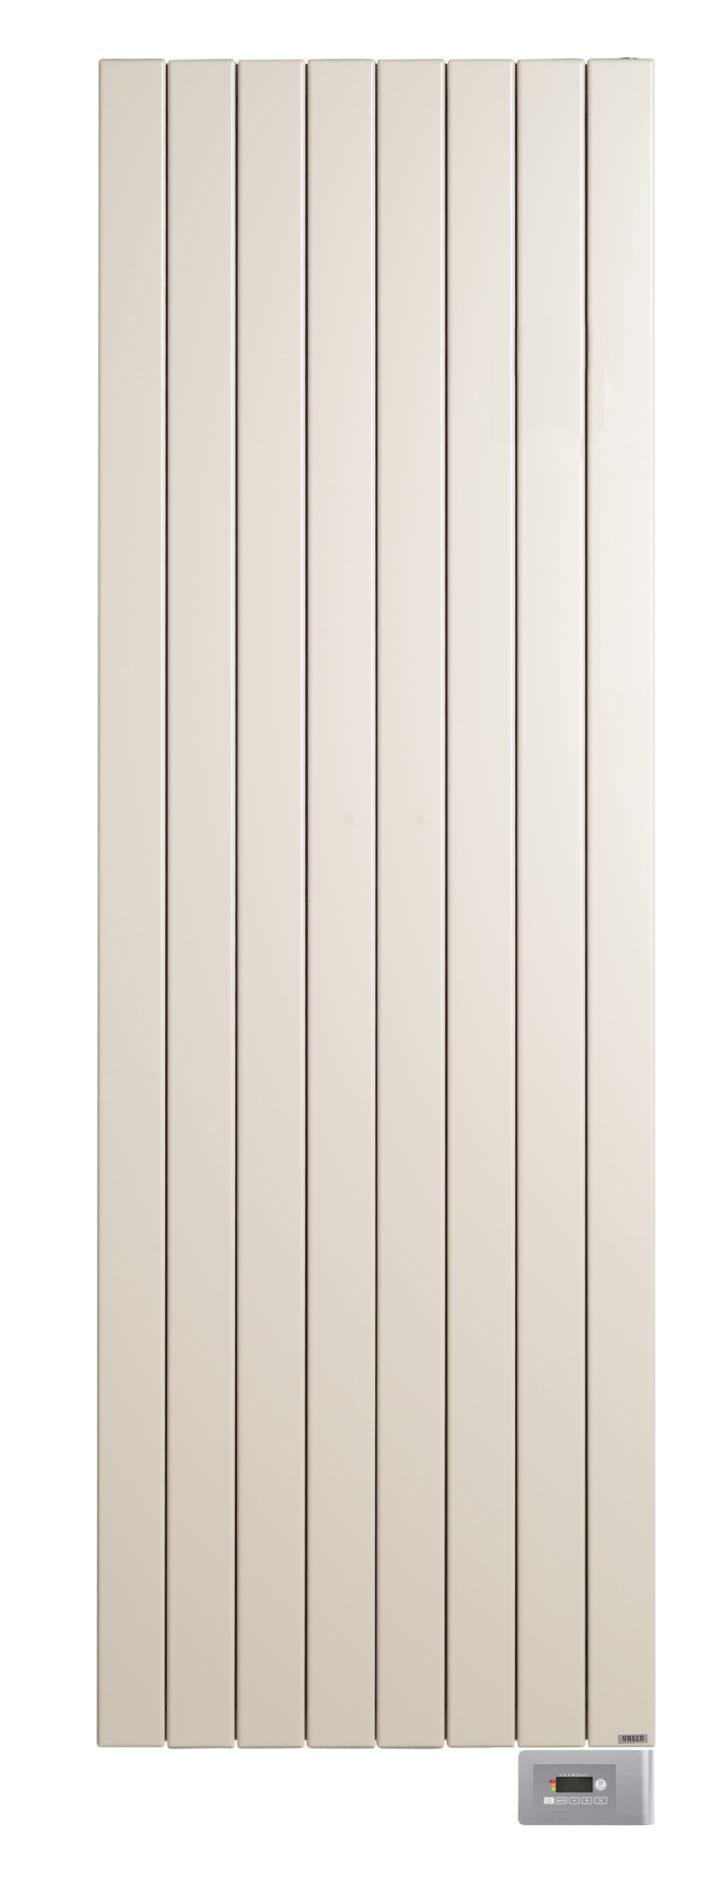 Medium Size of Heizkörper Badezimmer Elektroheizkörper Bad Wohnzimmer Für Wohnzimmer Vasco Heizkörper